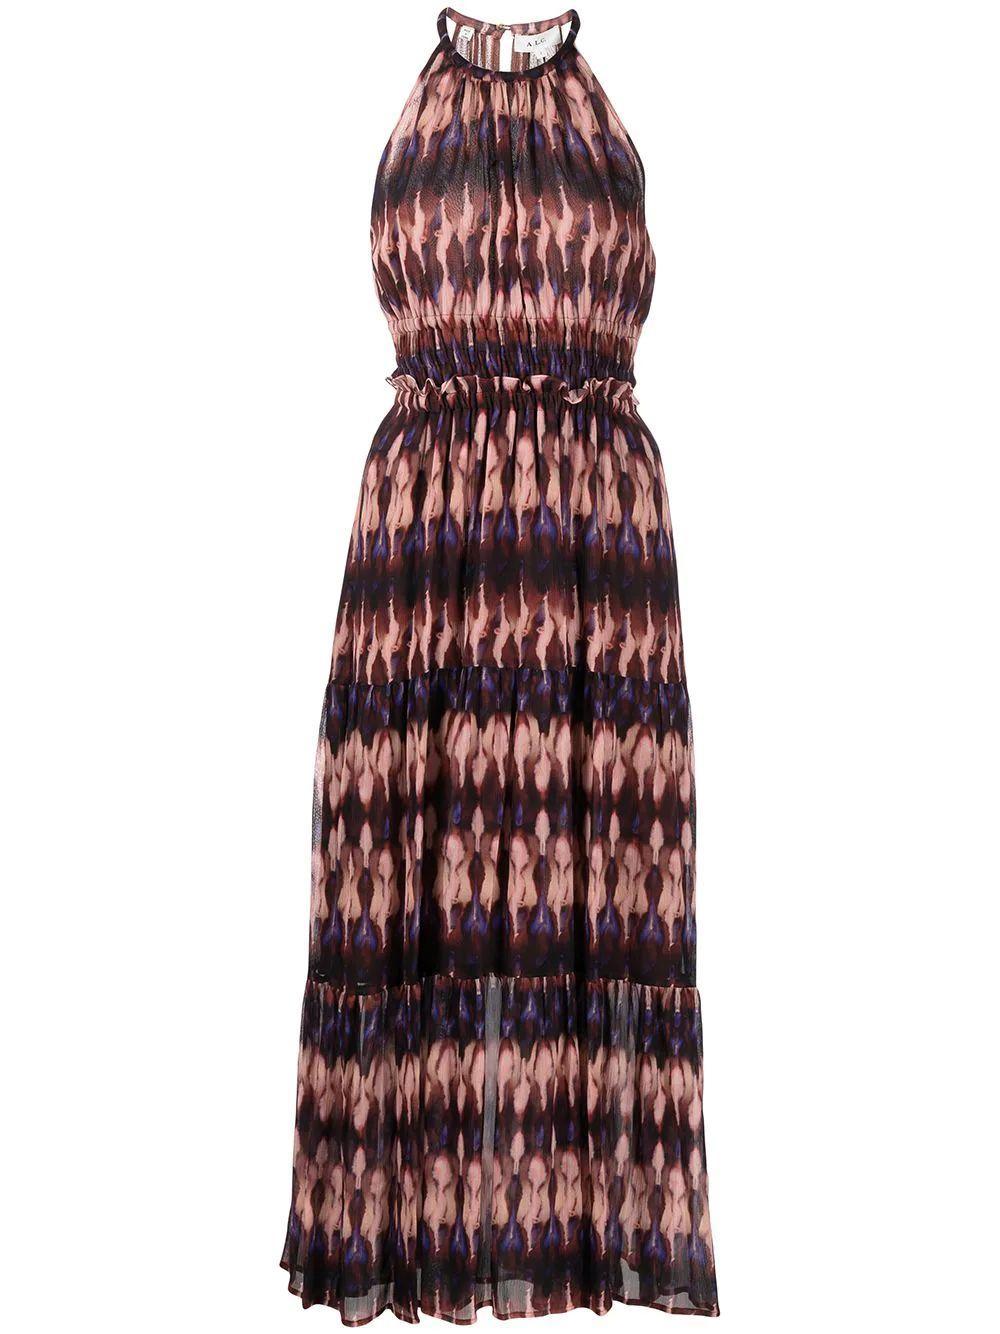 Elara Dress Item # 6DRES01398